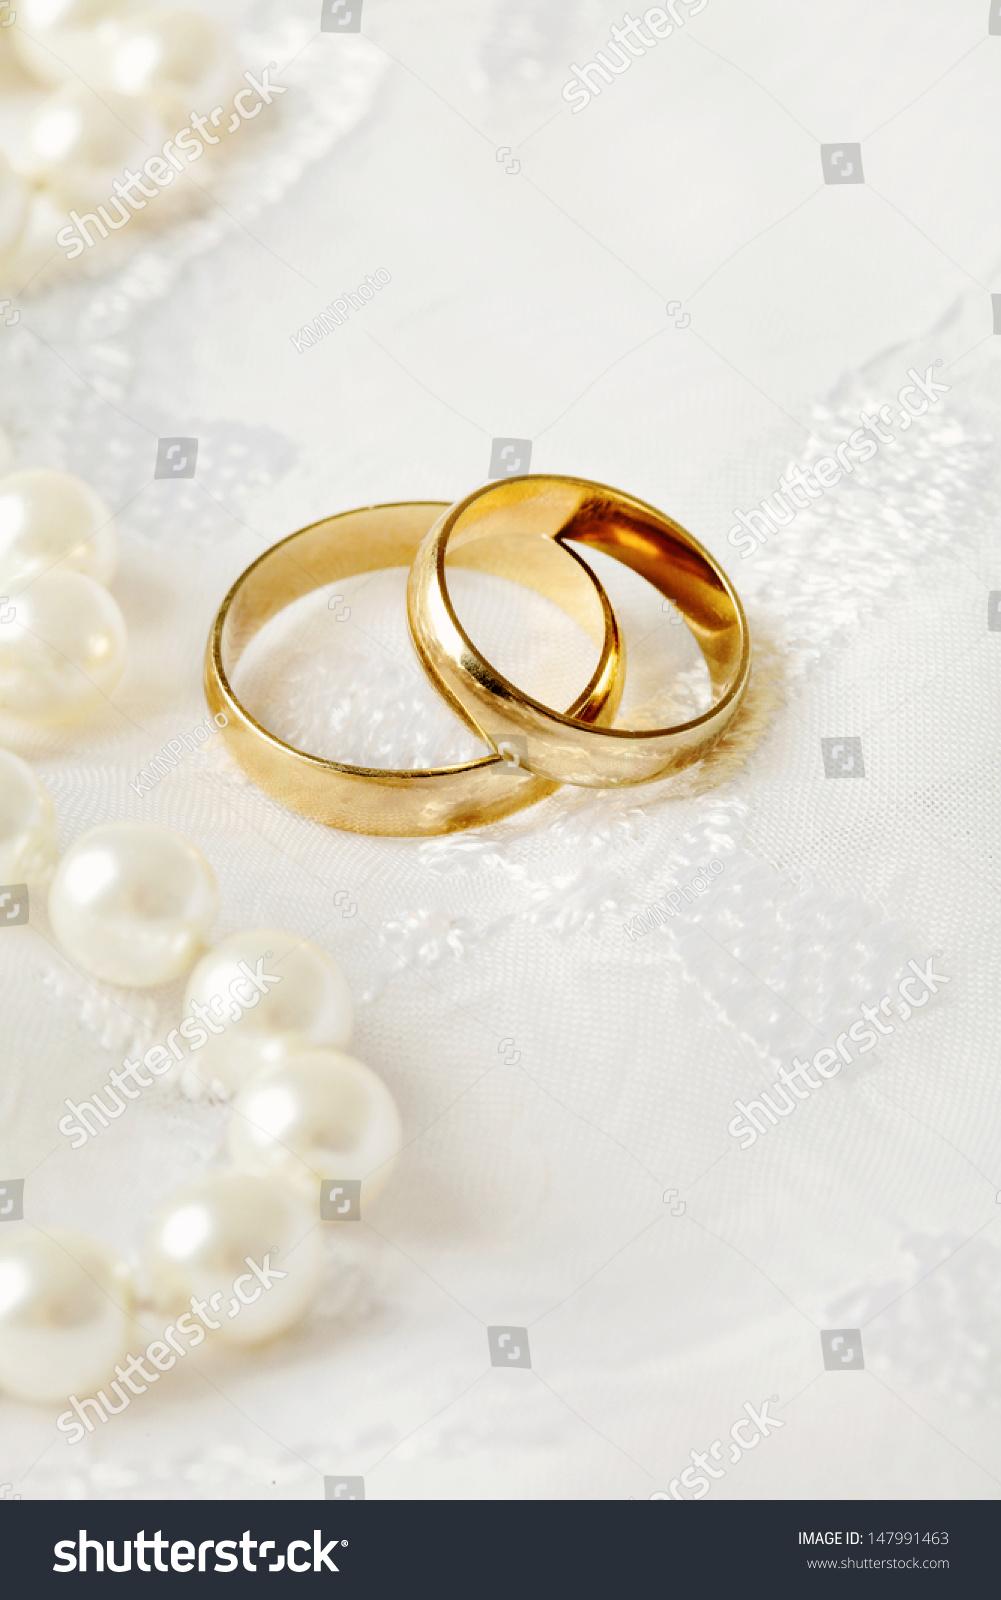 Two Wedding Rings Wedding Invitation Stock Photo (Royalty Free ...